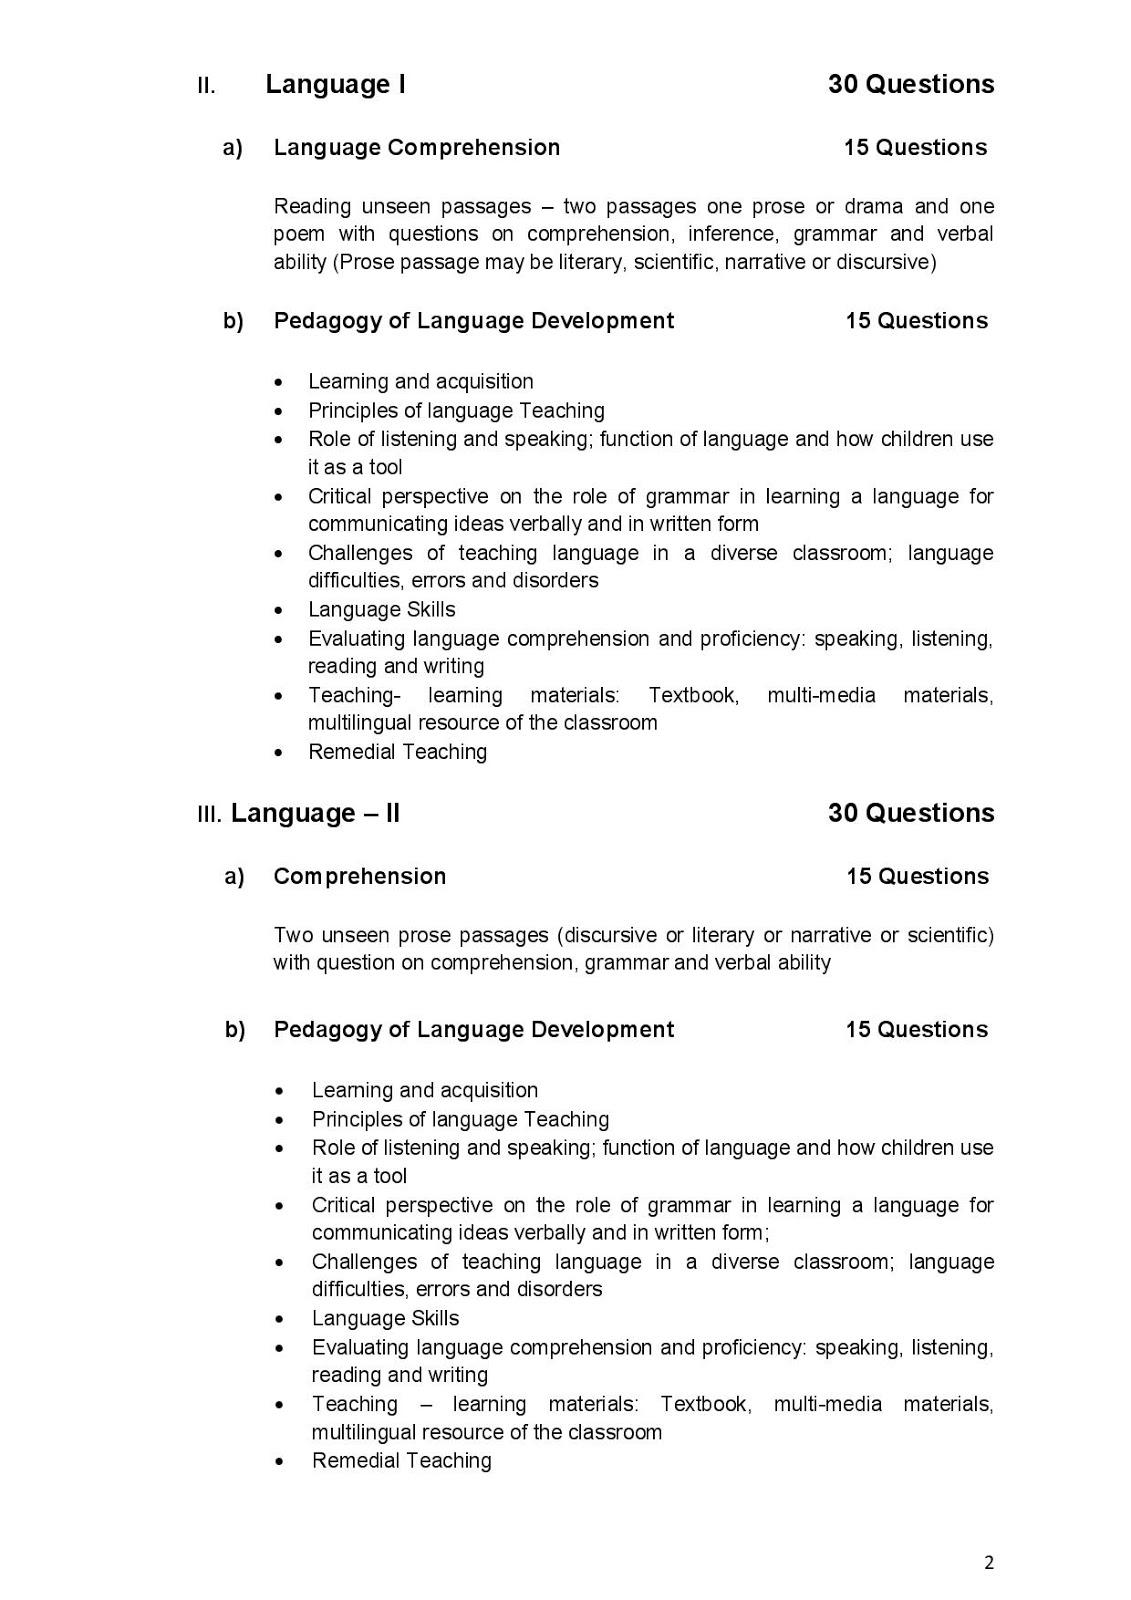 Central Teacher Eligibility Test (CTET) Syllabus for classes I to V